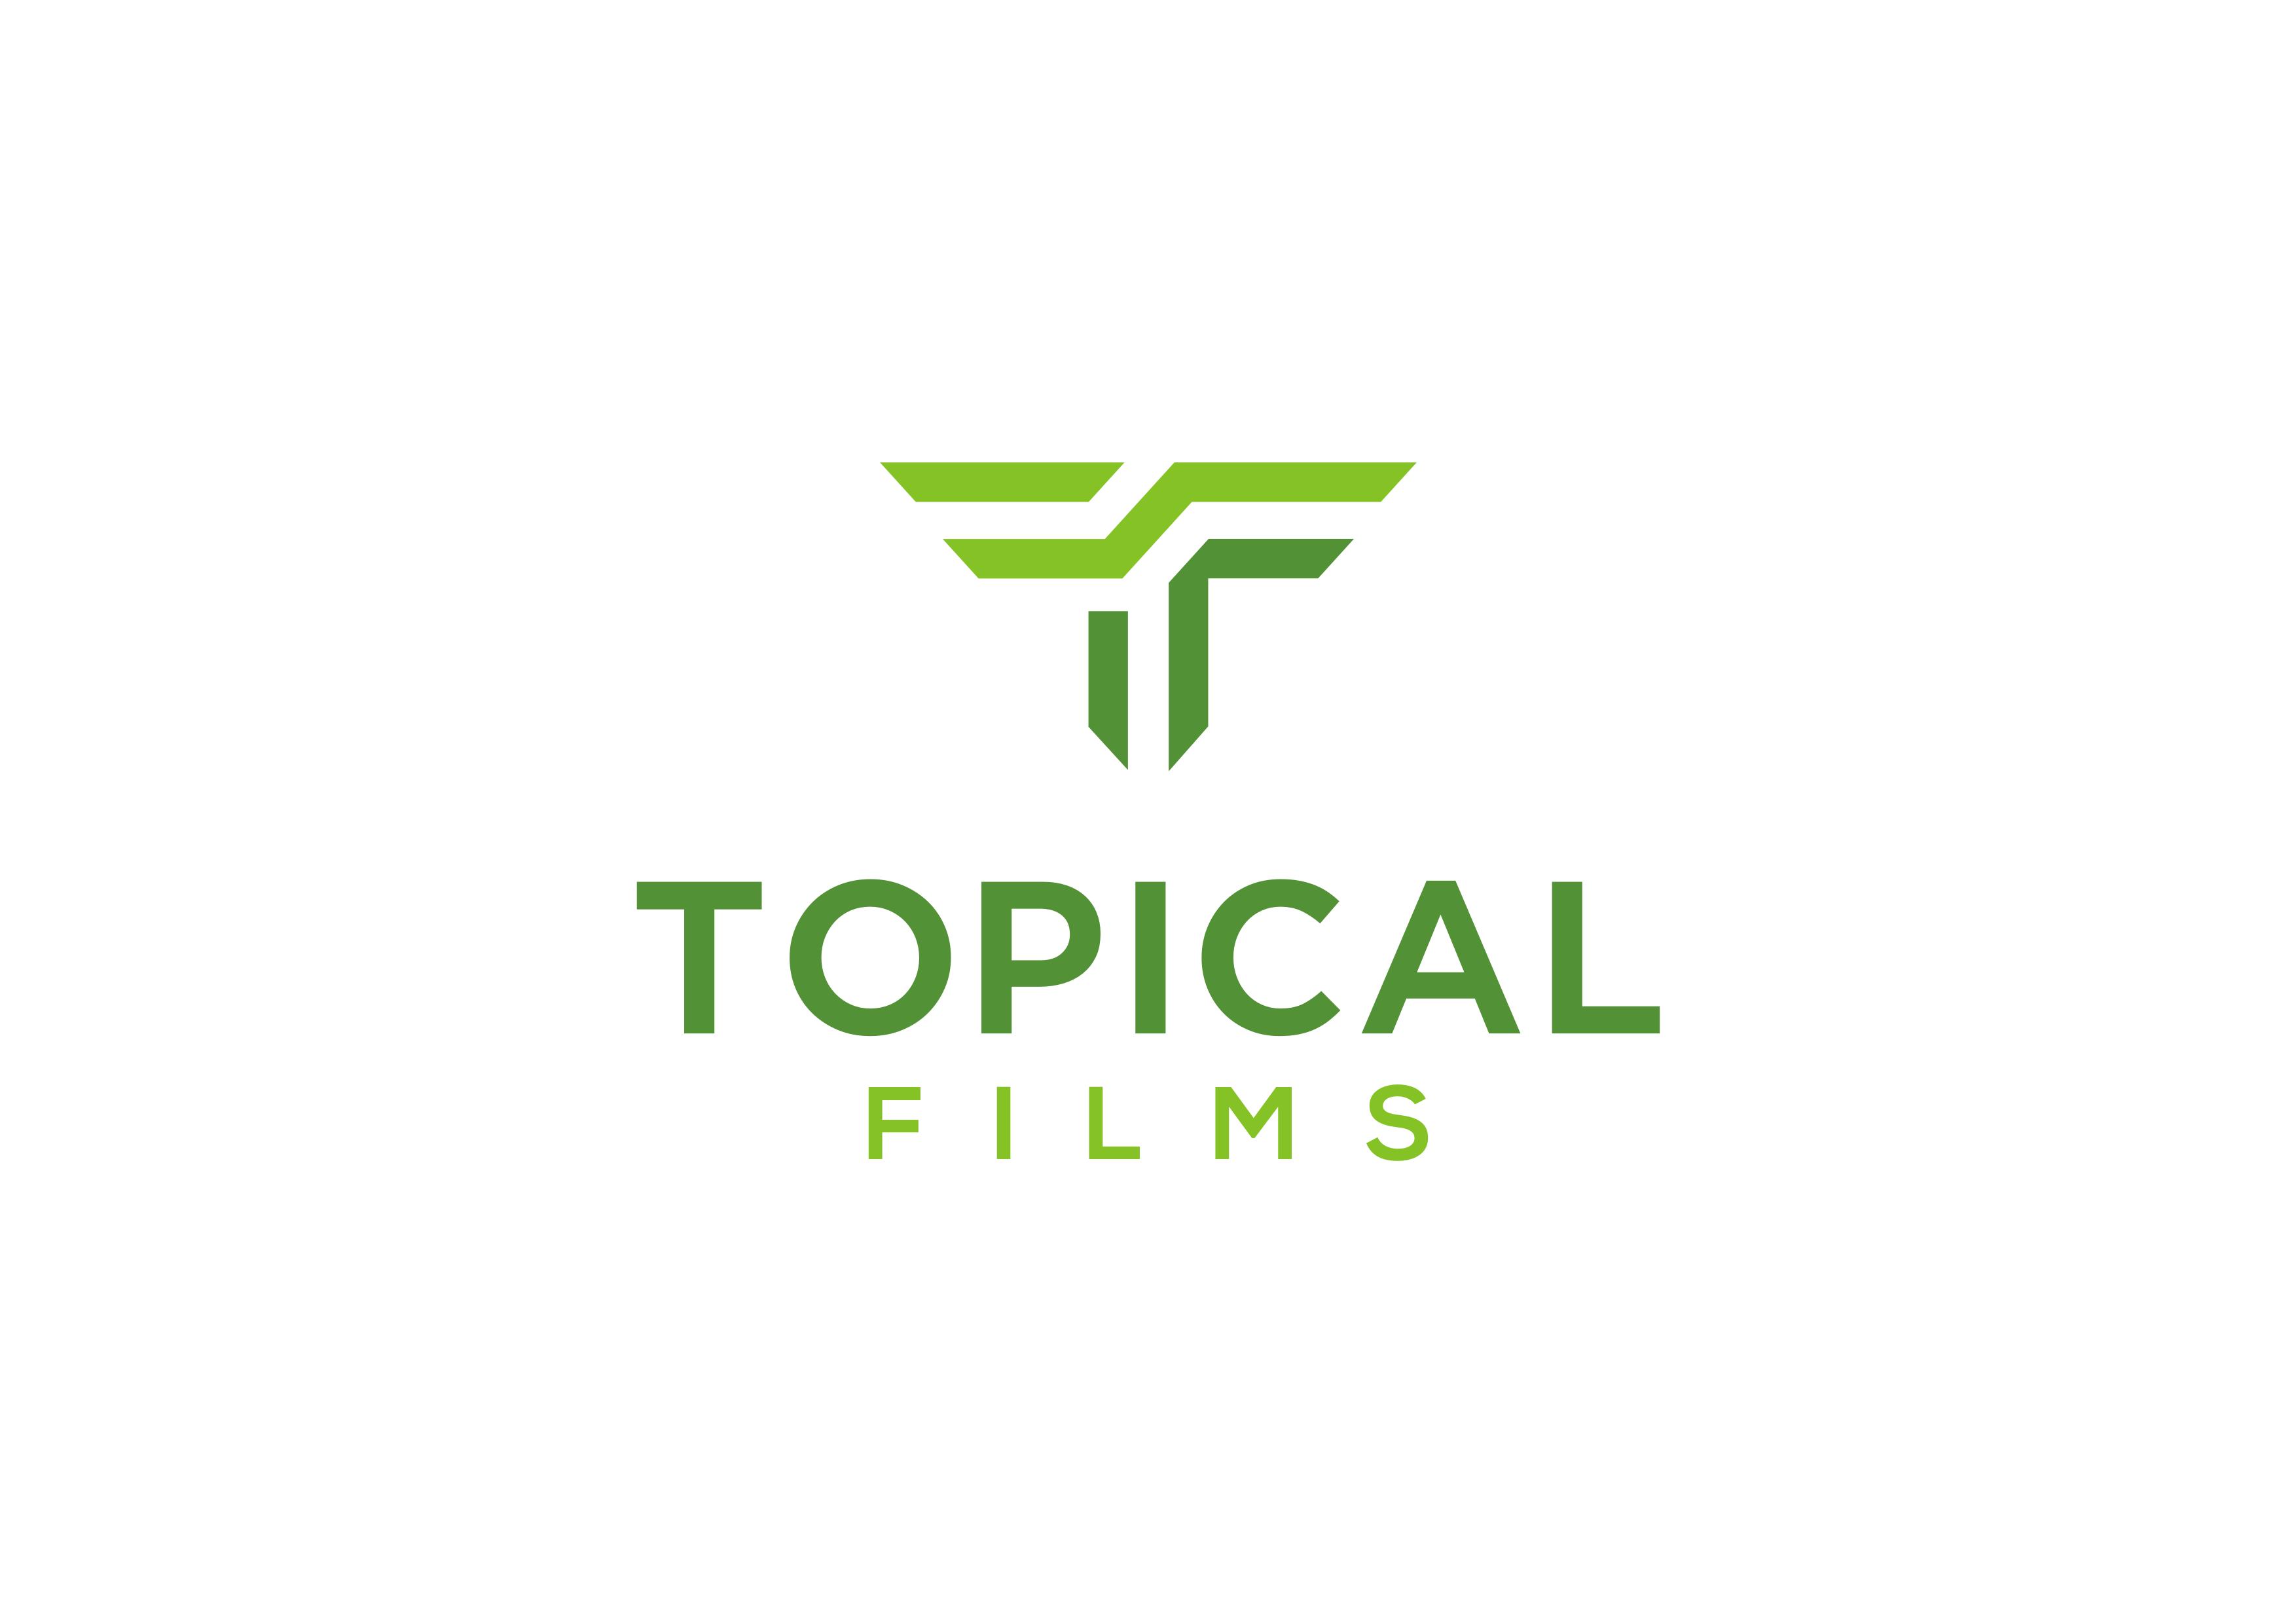 Music Festival Film Company needs a Sleek New Logo!